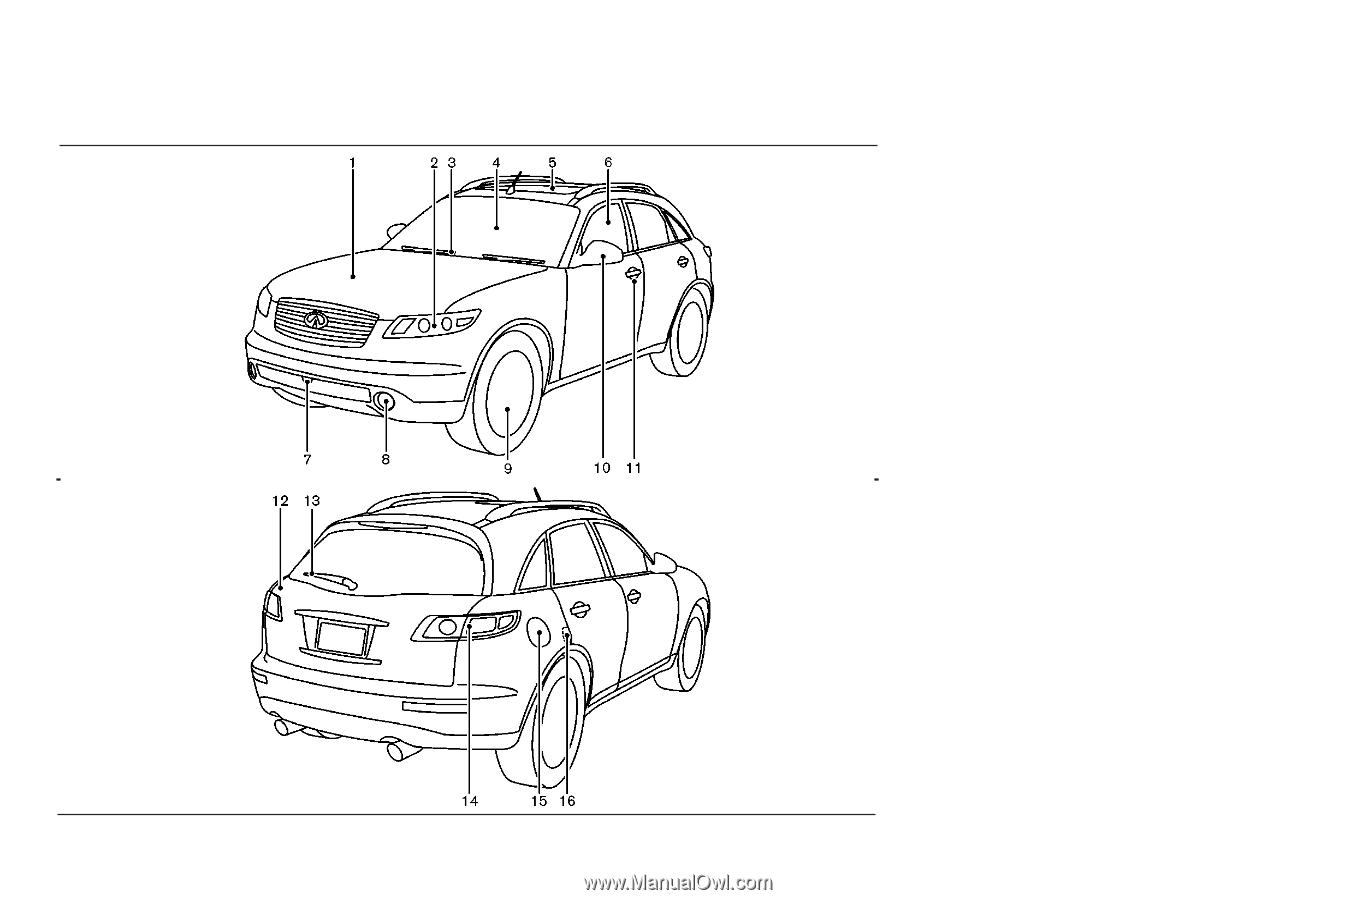 2008 Infiniti Fx35 Service Manual Infiniti Car